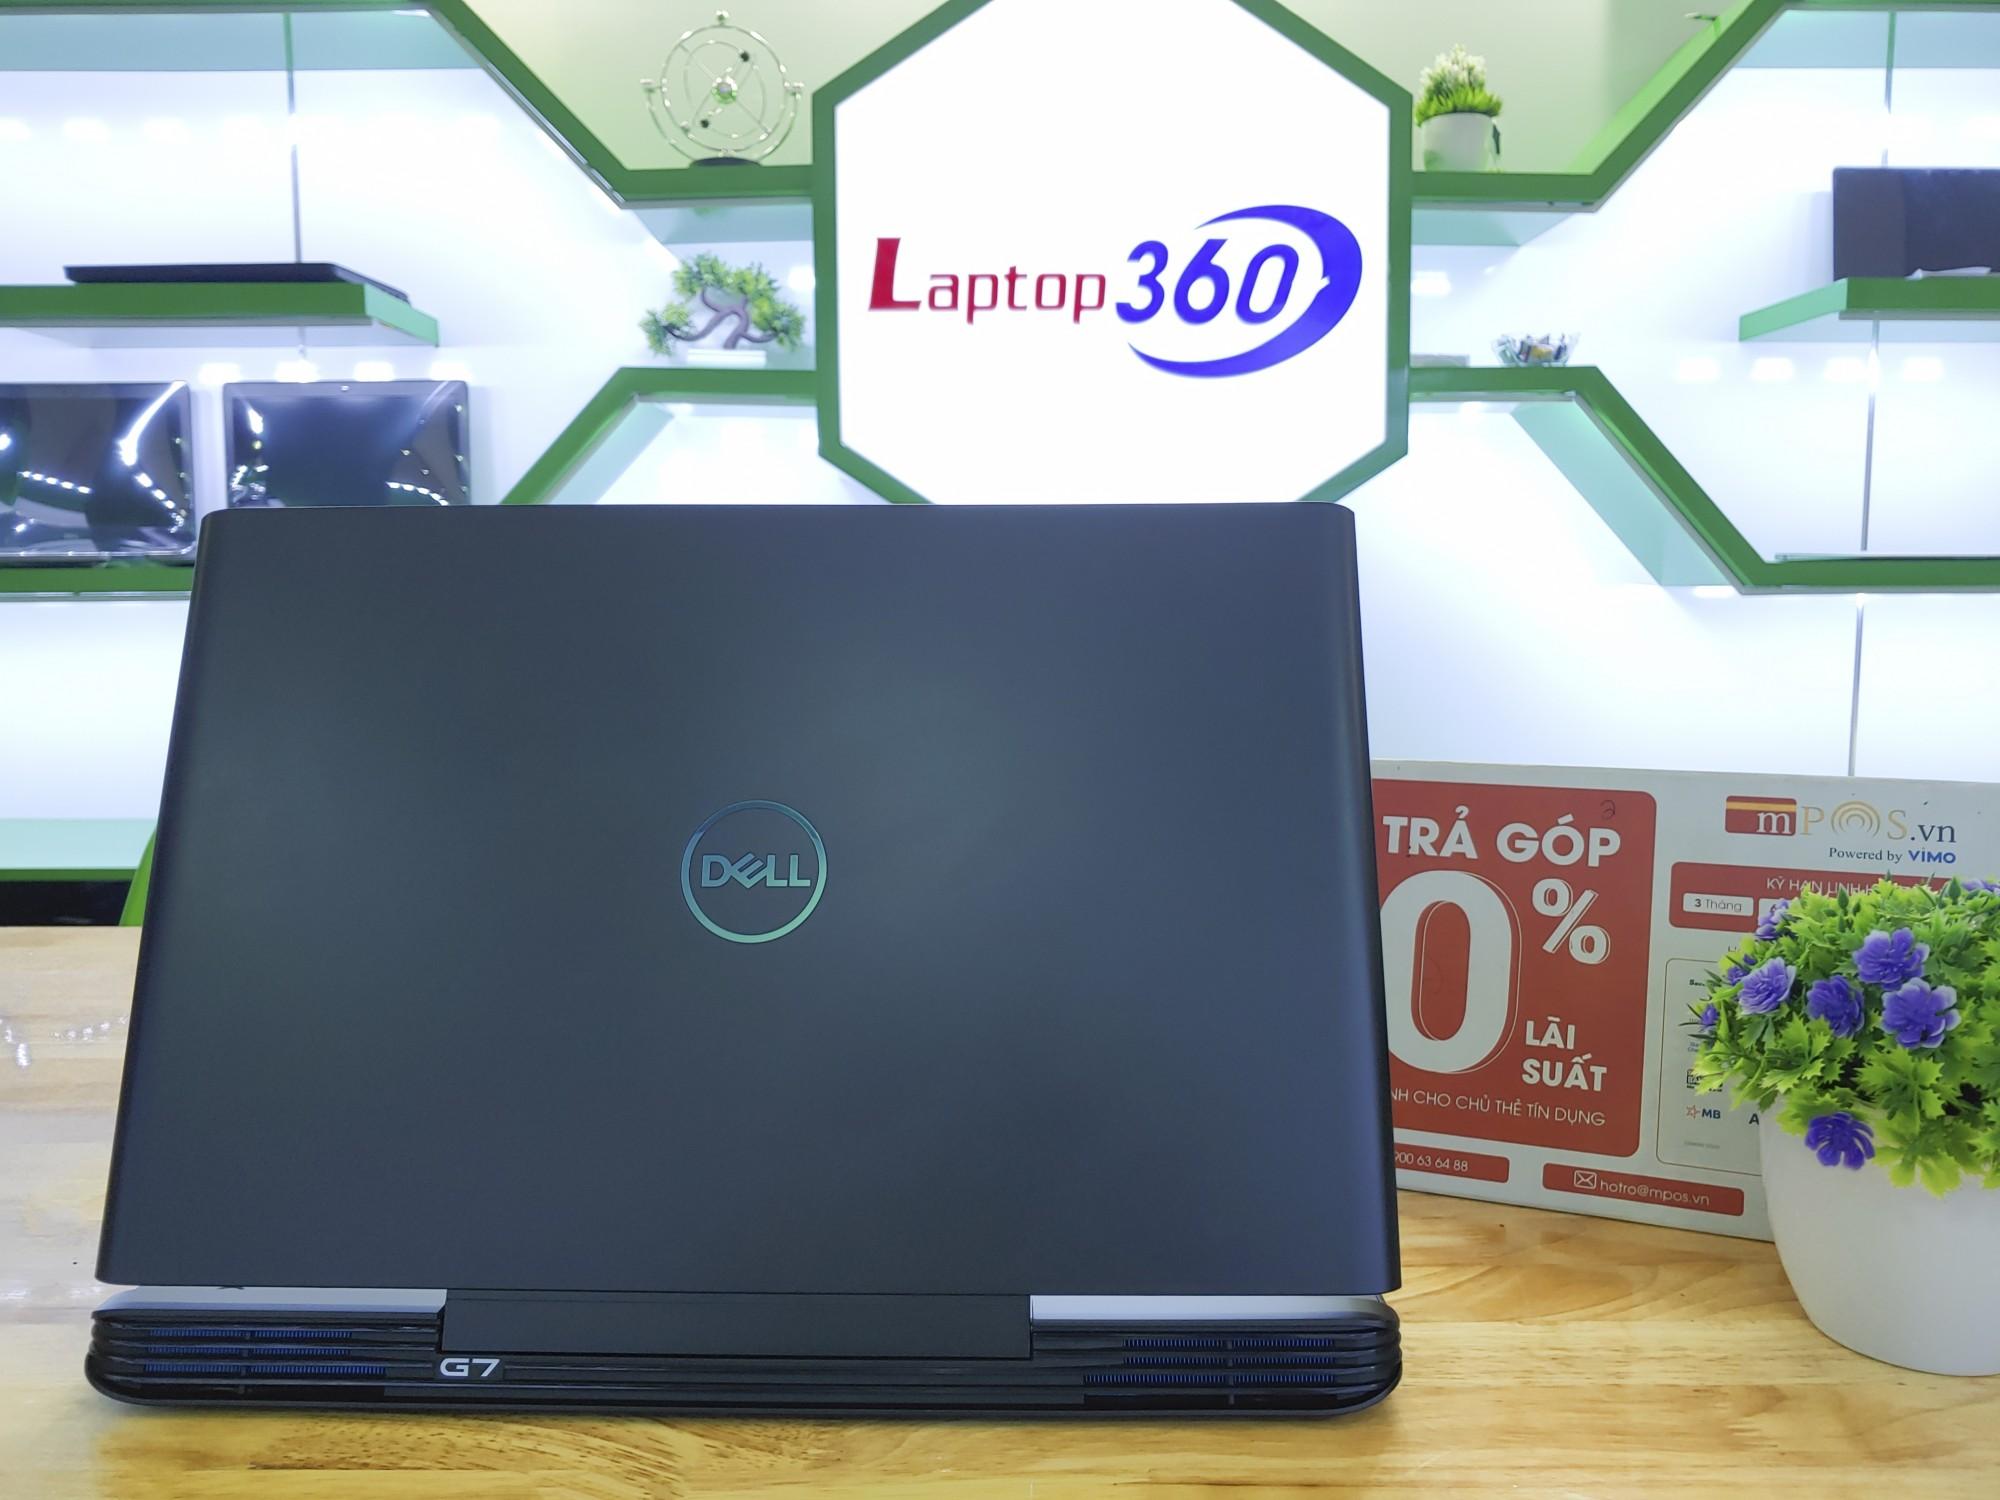 Dell Inspiron G7 7588